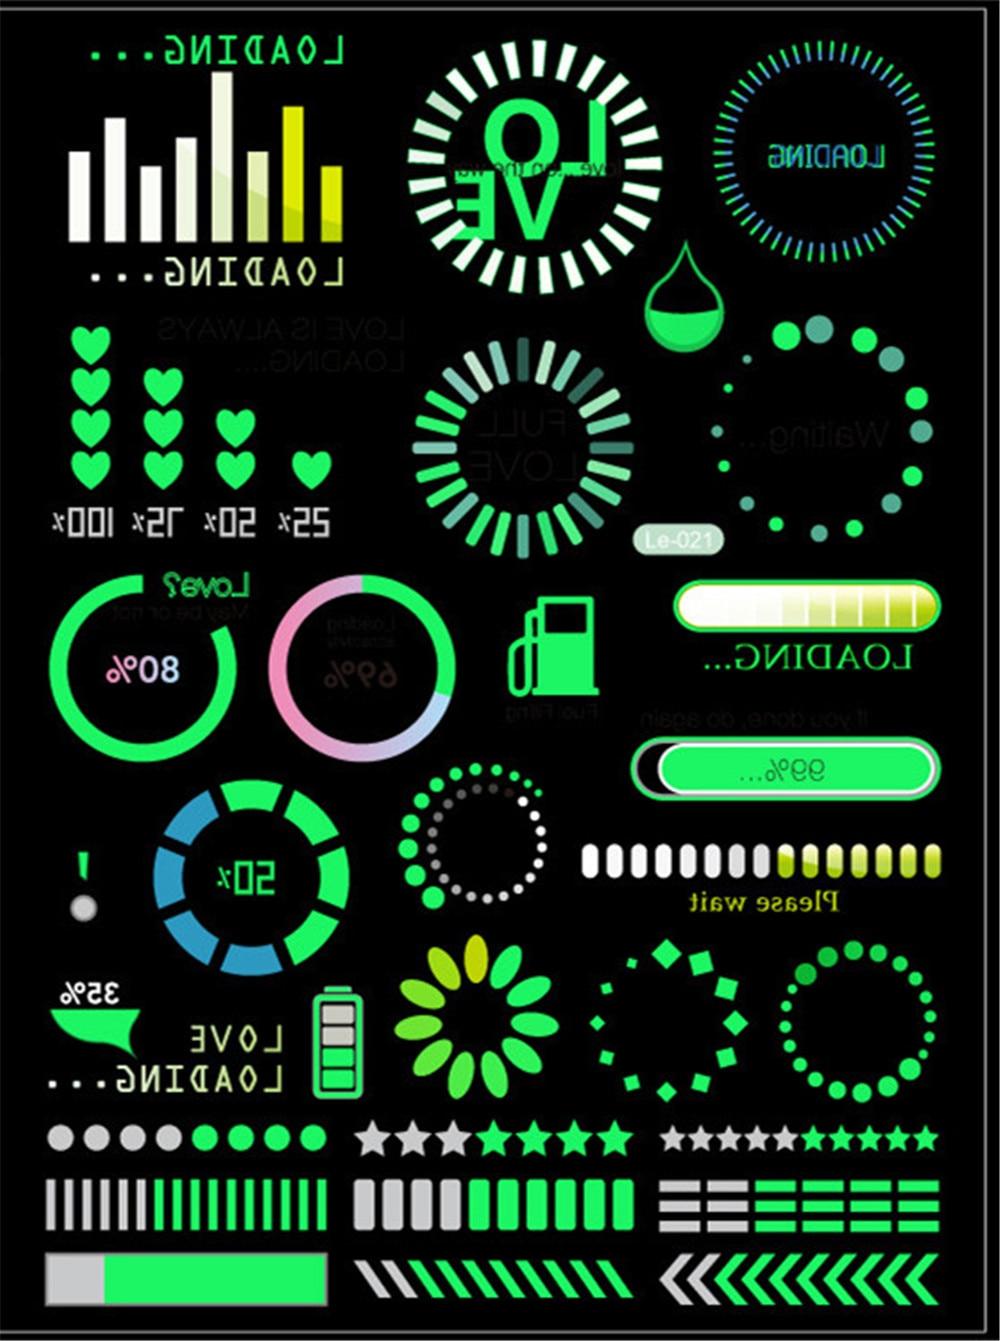 Glow In The Dark Toys  Logo Sign Symbol  Tattoo Sticker Green Waterproof One-Time Funny Elements Tattoo Sticker  Cartoon Hats